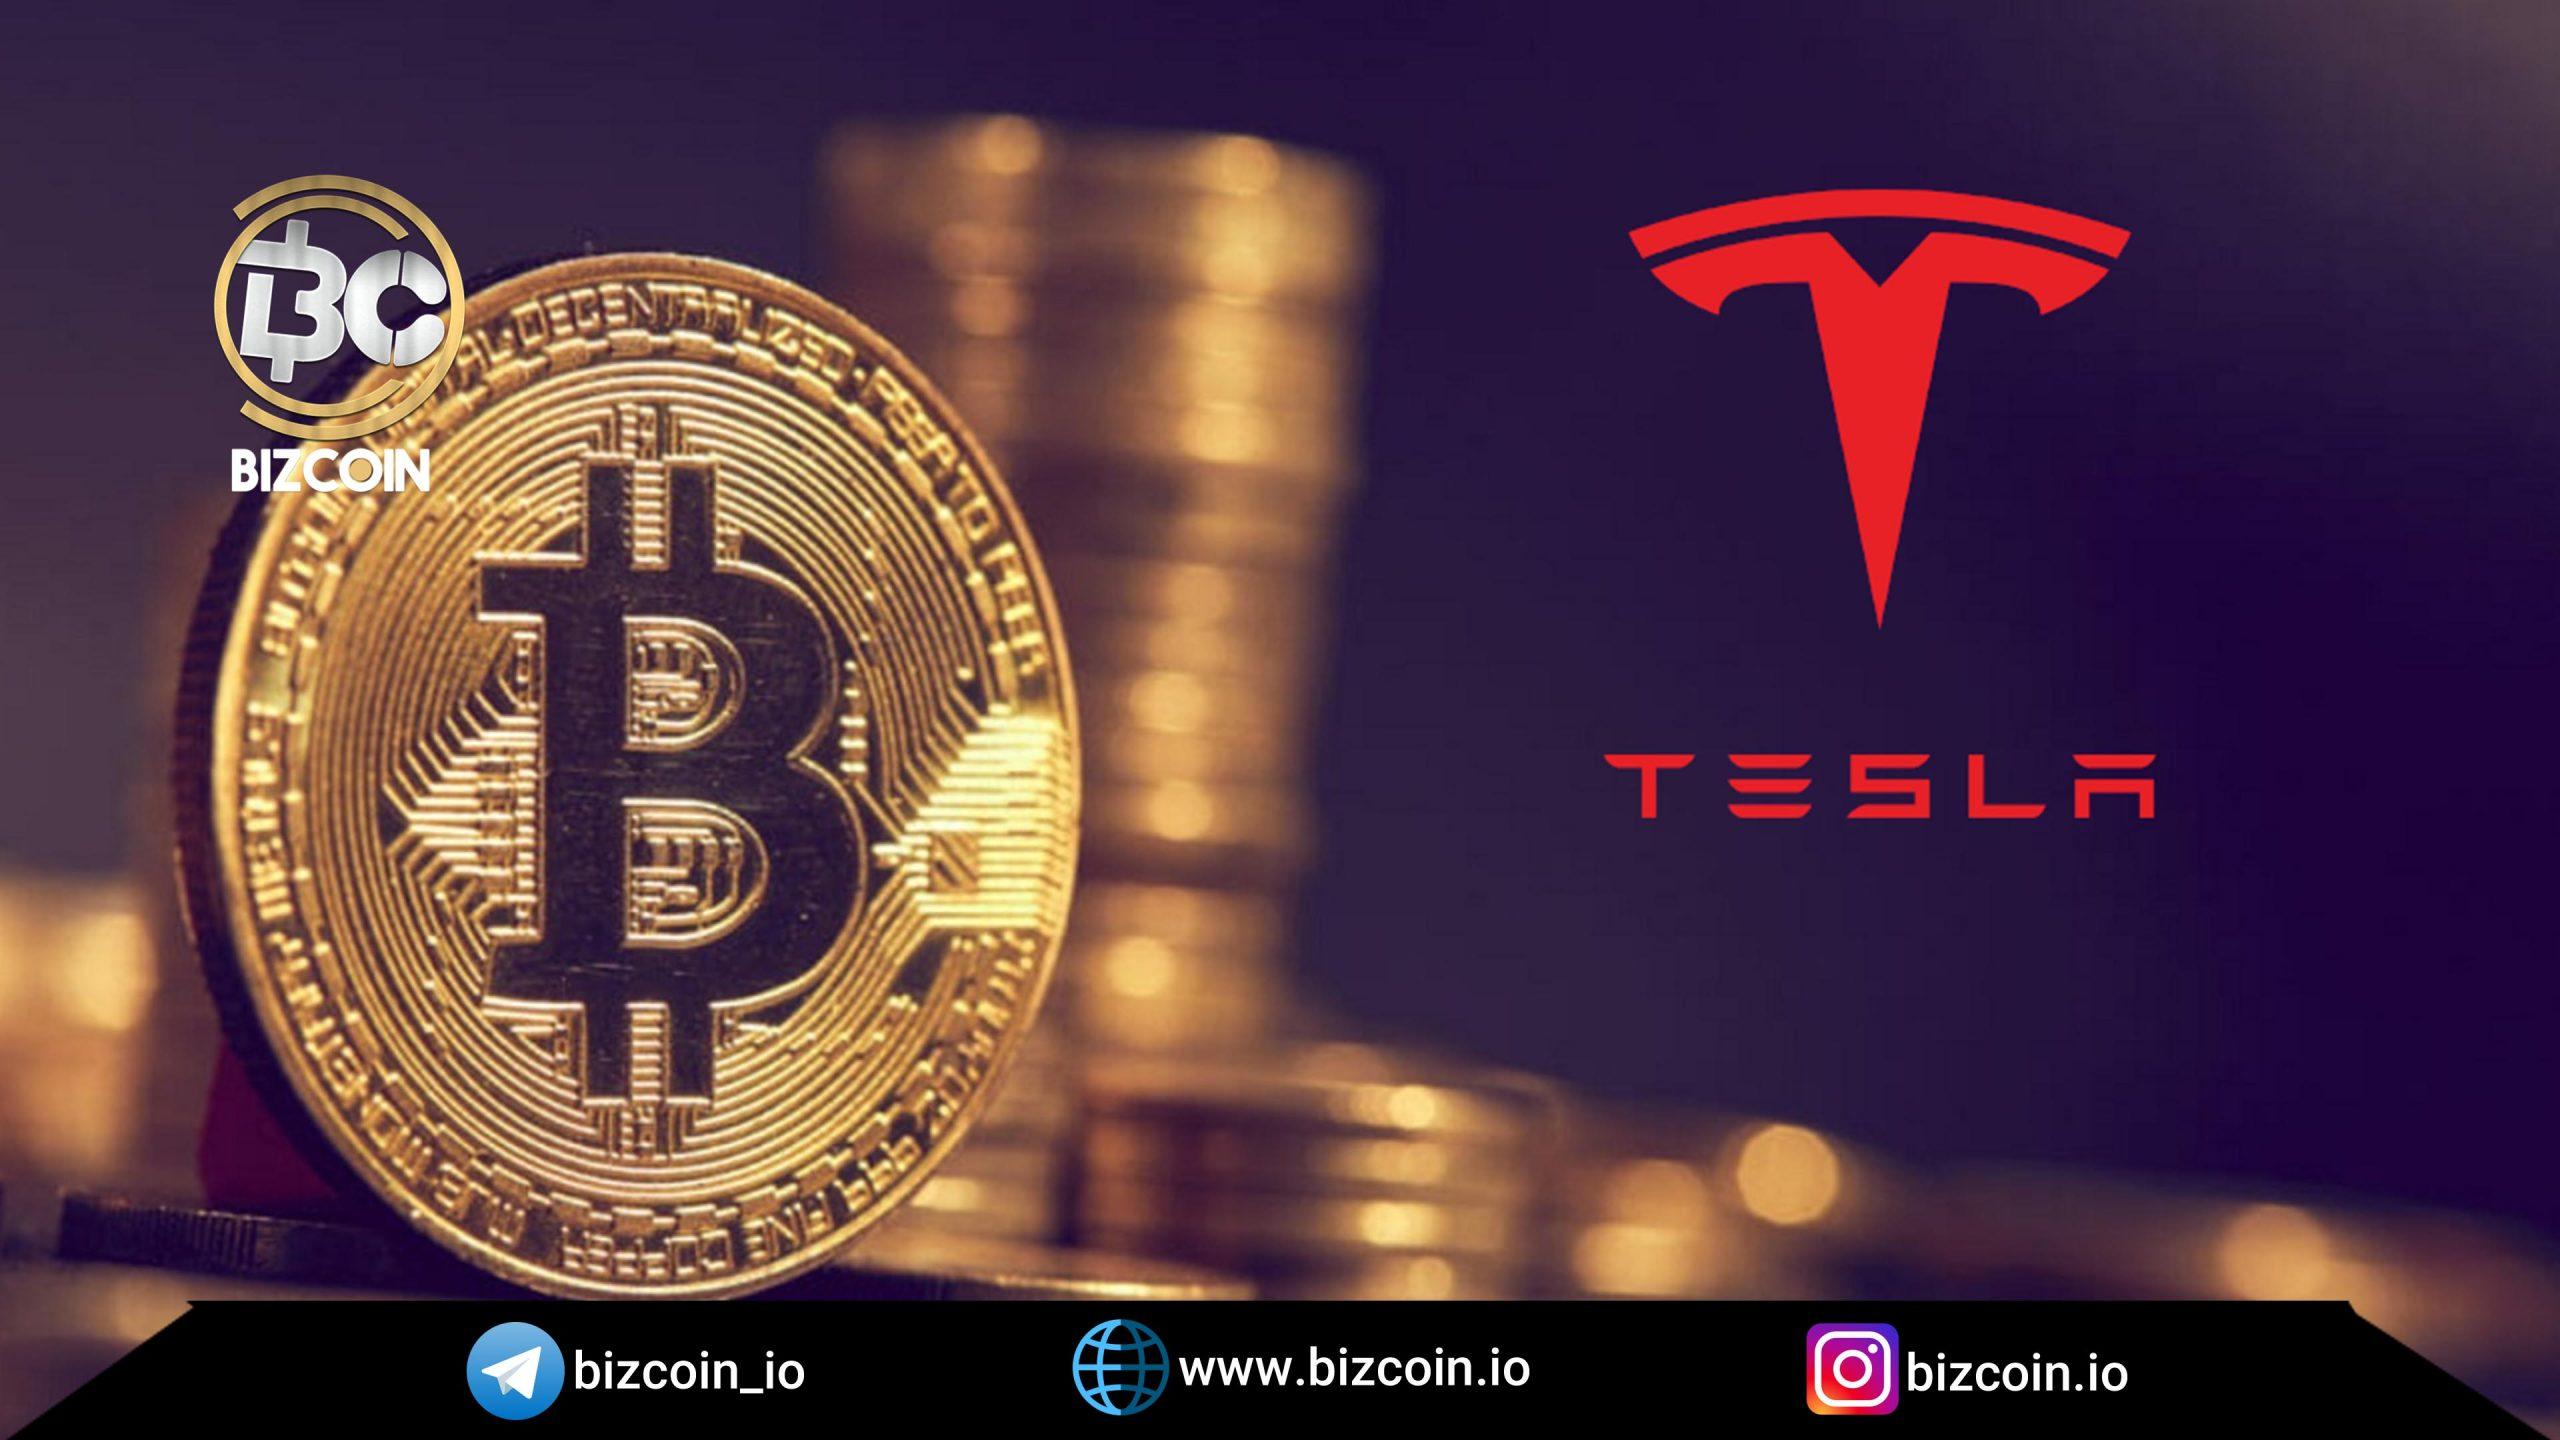 Teslas million dollar profit scaled سود میلیون دلاری تسلا از فروش بیت کوین